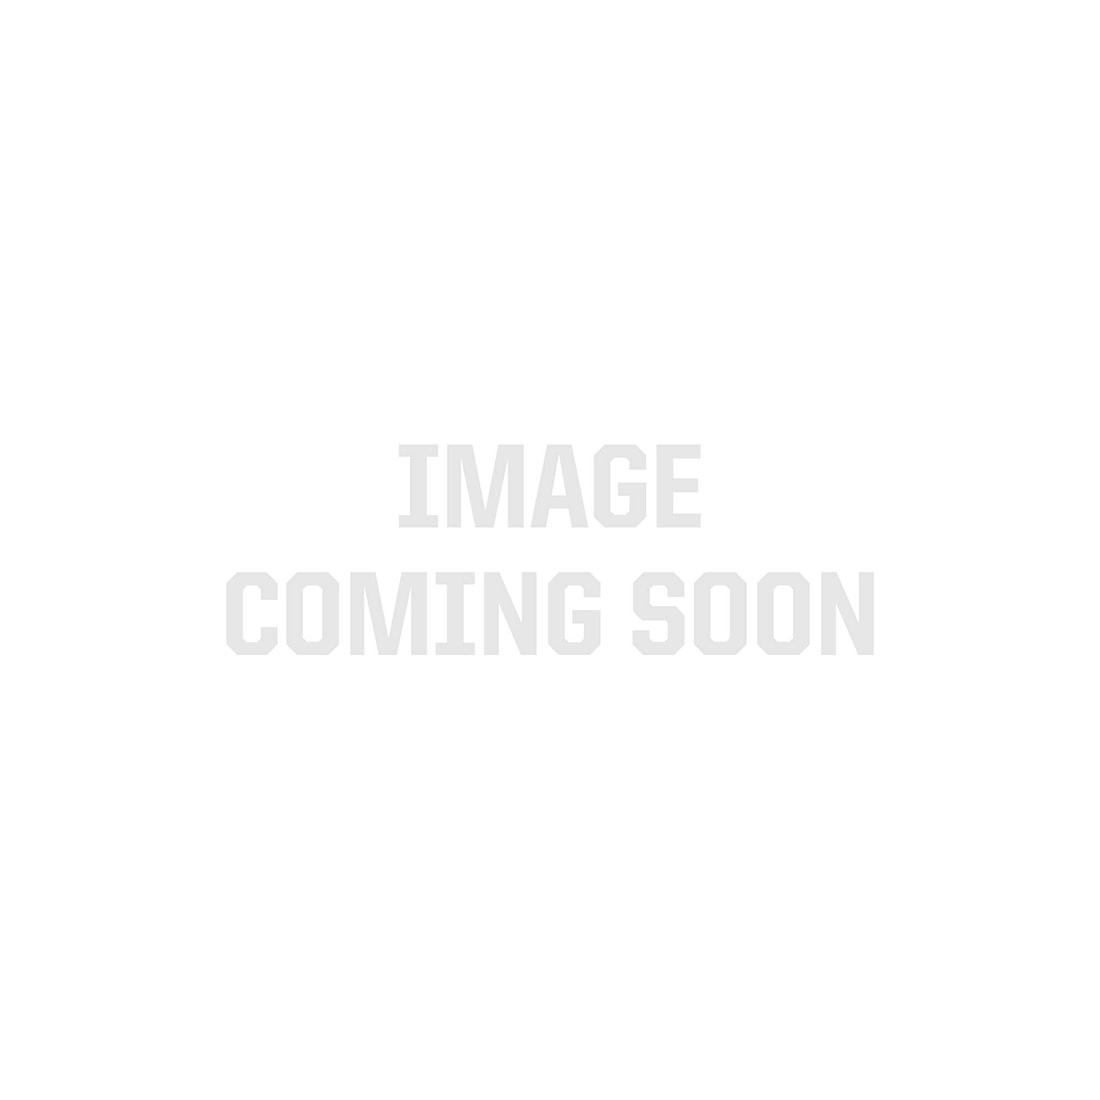 Waterproof Daylight White 3528 Quad Row LED Strip Light, 450/m, 28mm wide, Sample Kit